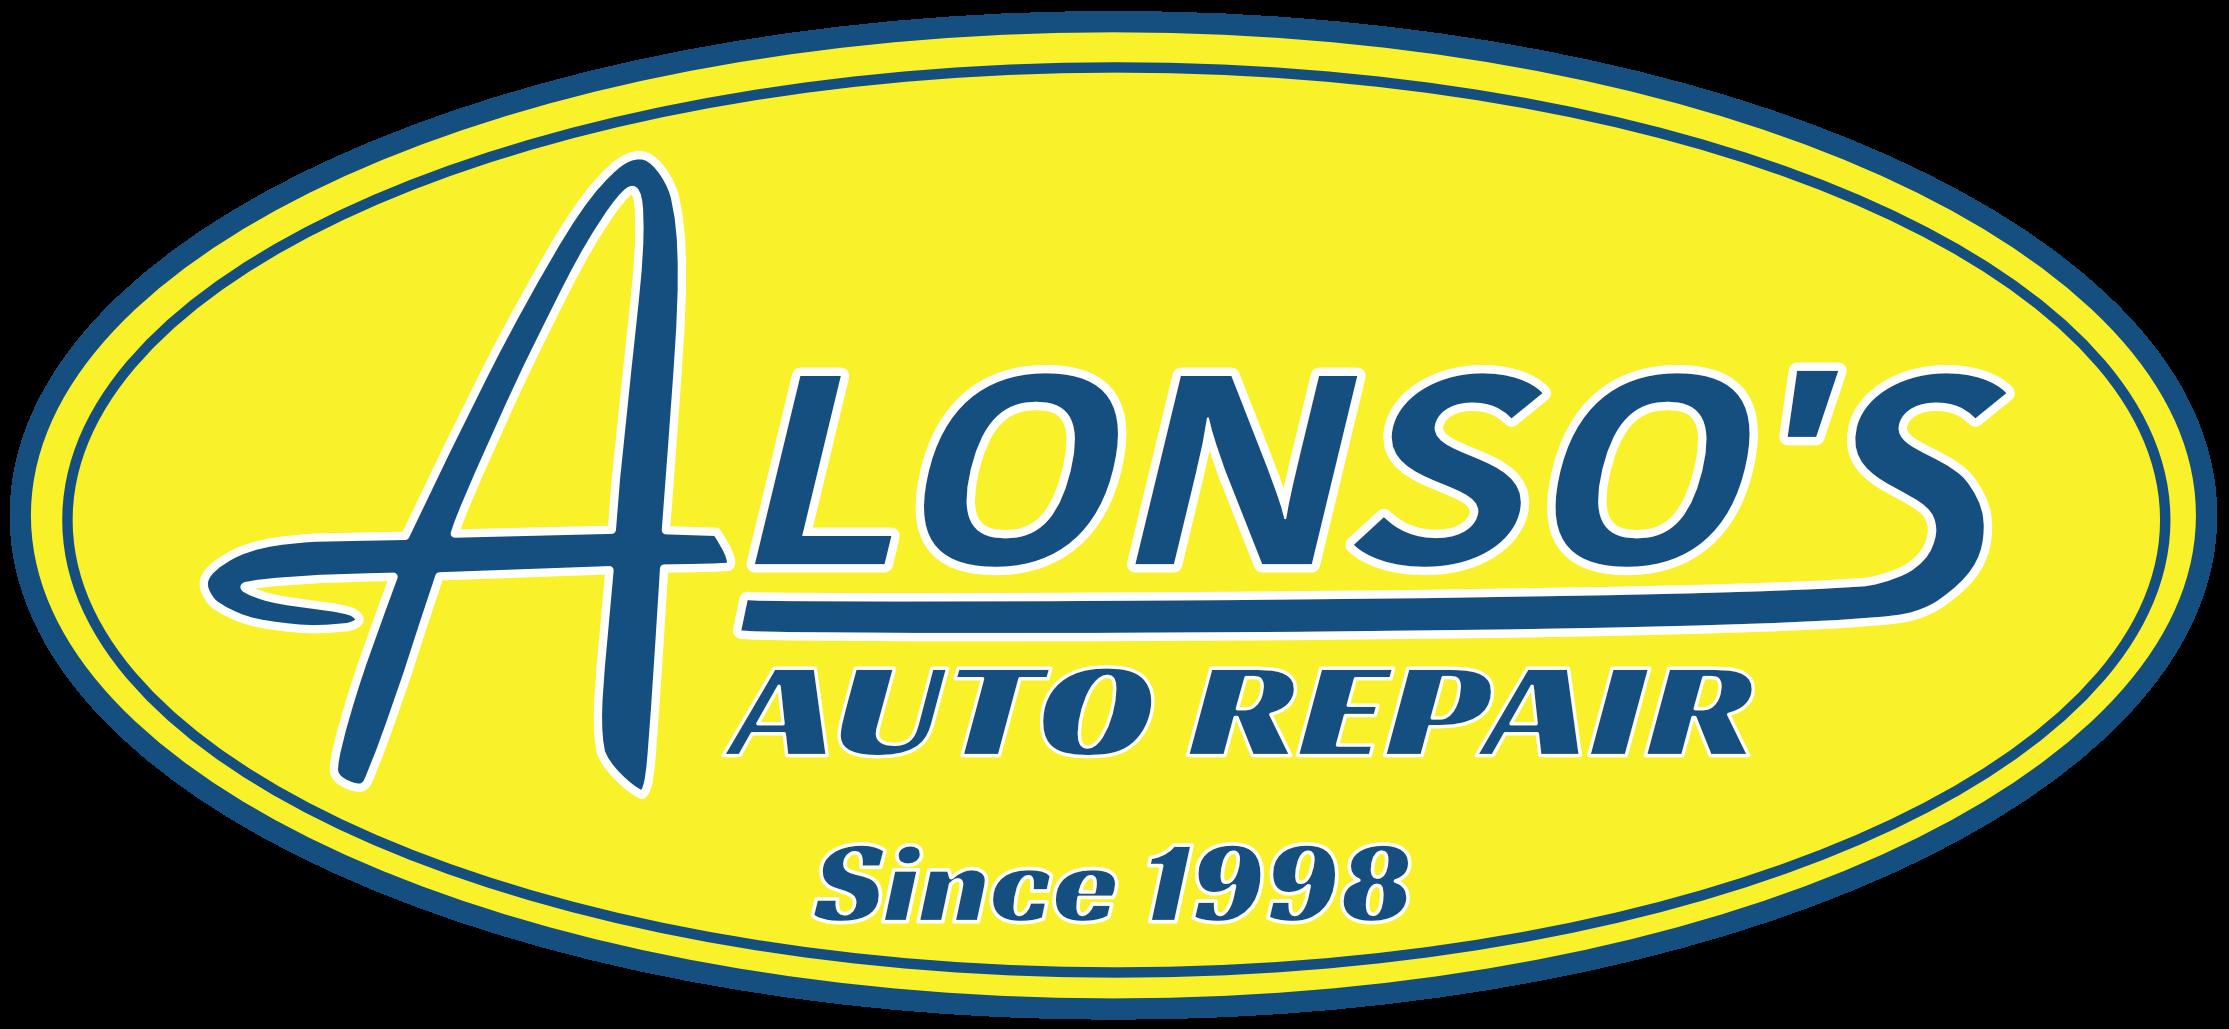 alonsos auto repair logo